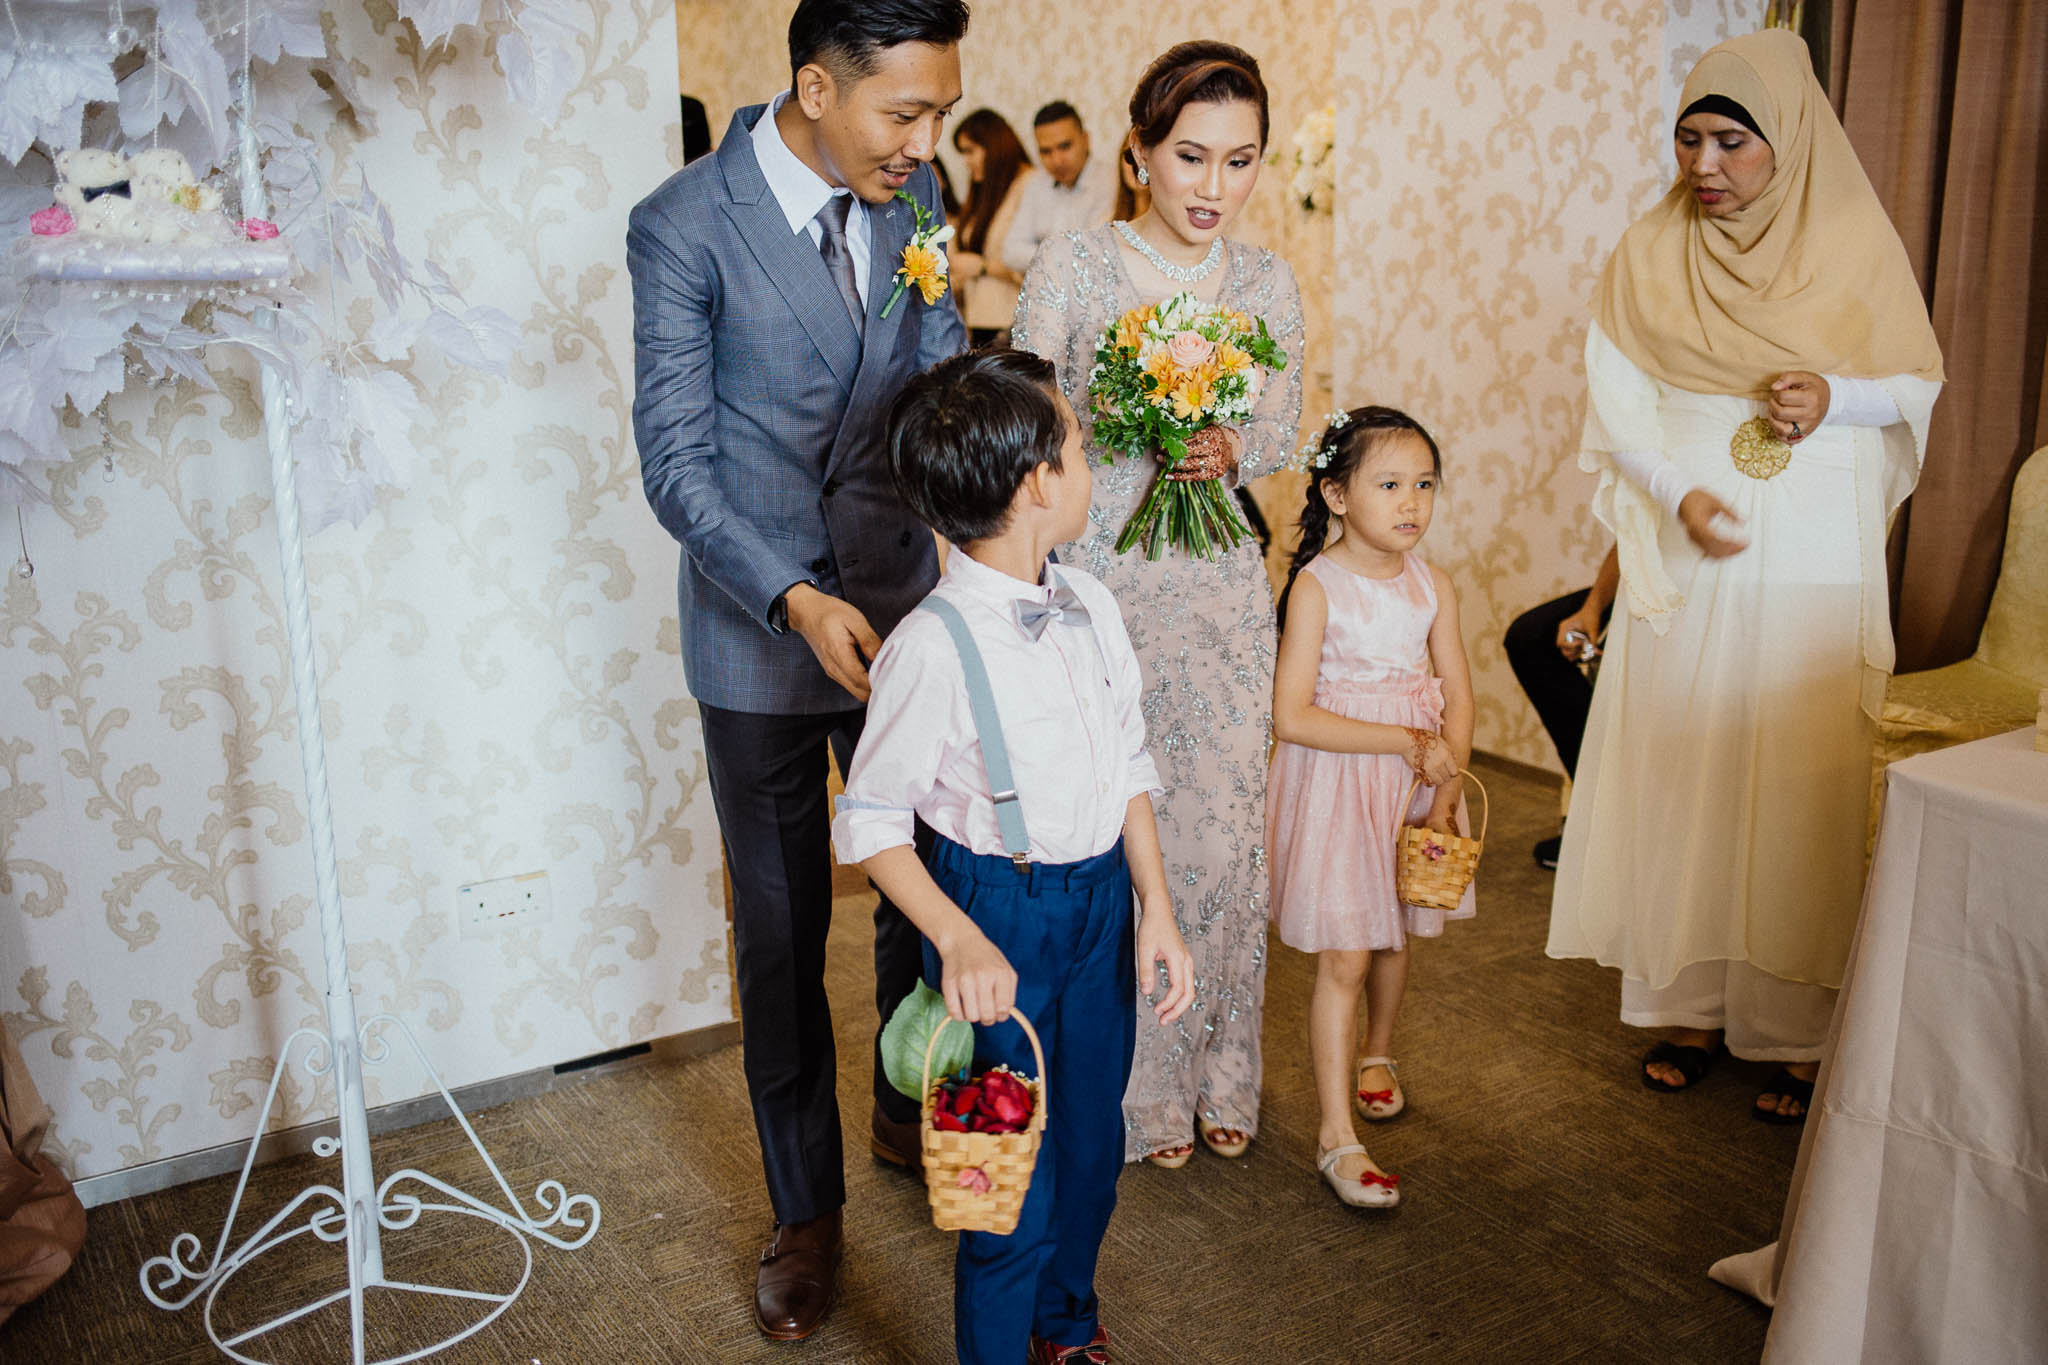 singapore-wedding-photographer-addafiq-nufail-044.jpg